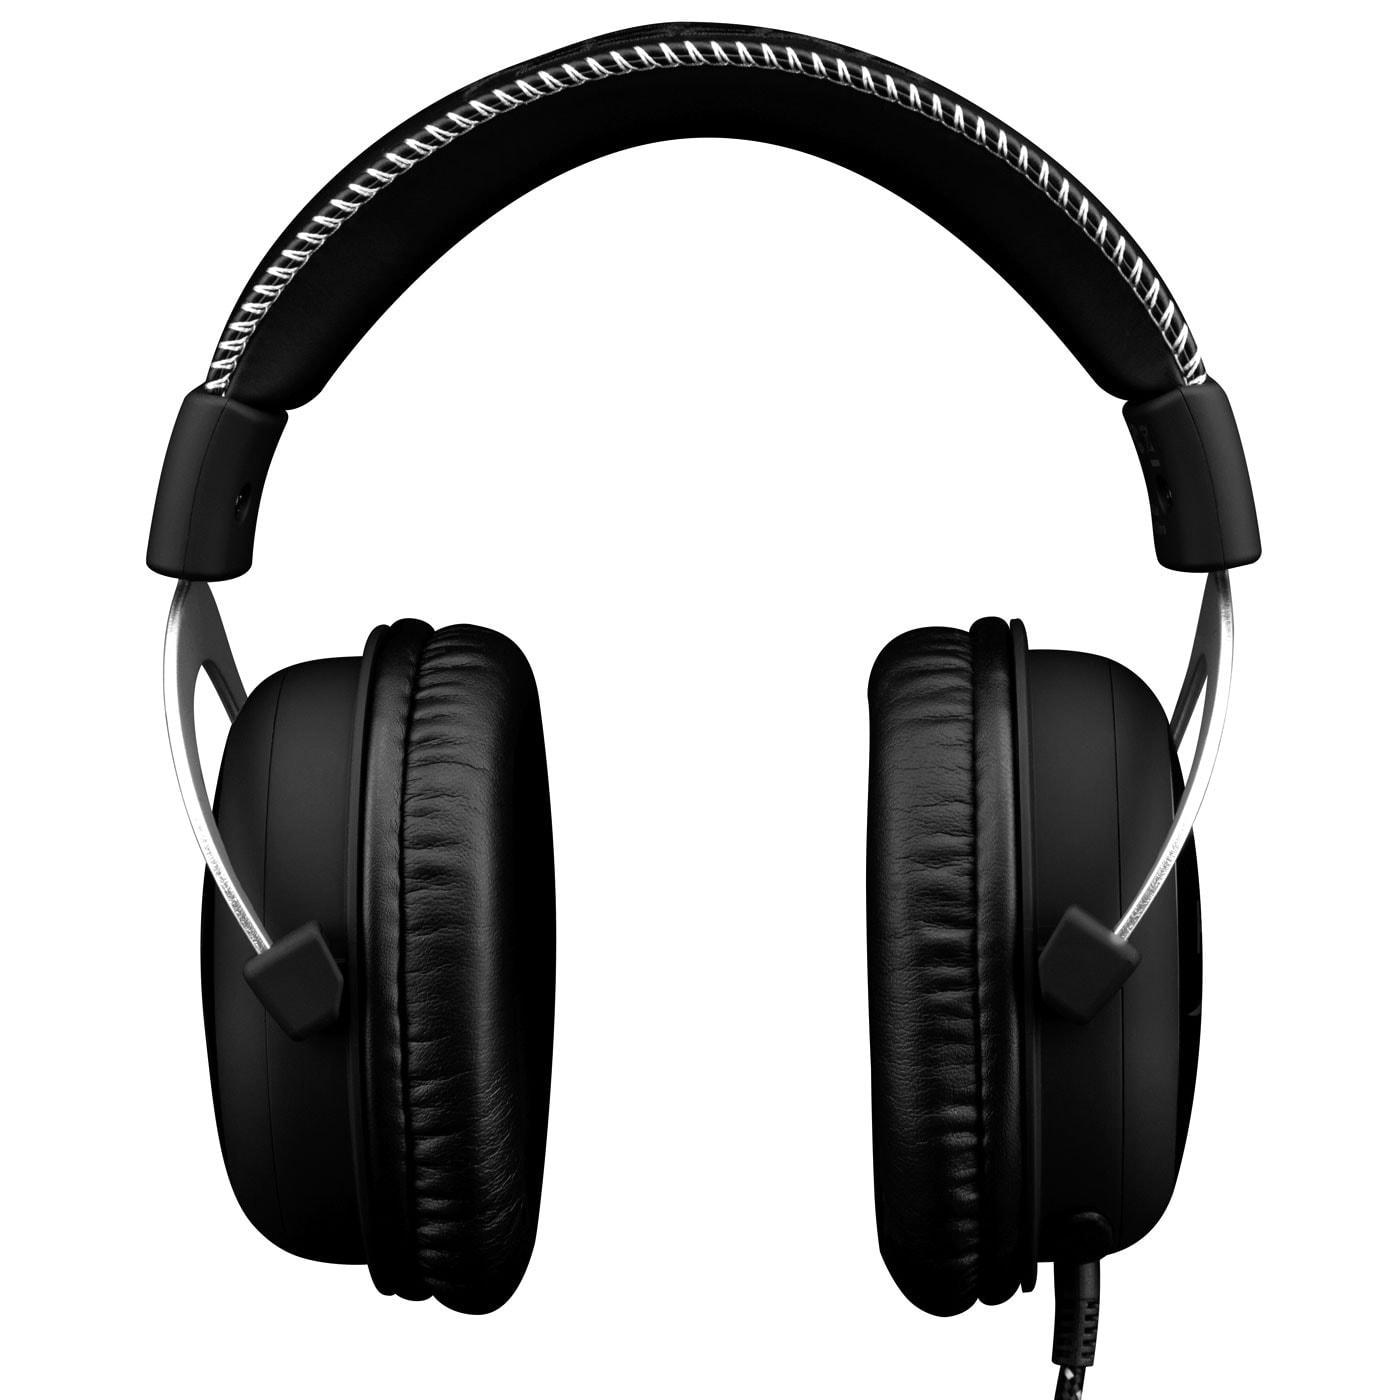 HyperX CloudX Gaming Headset (Silver) (HX-HSCX-SR/EM) - Achat / Vente Micro-casque sur Cybertek.fr - 2